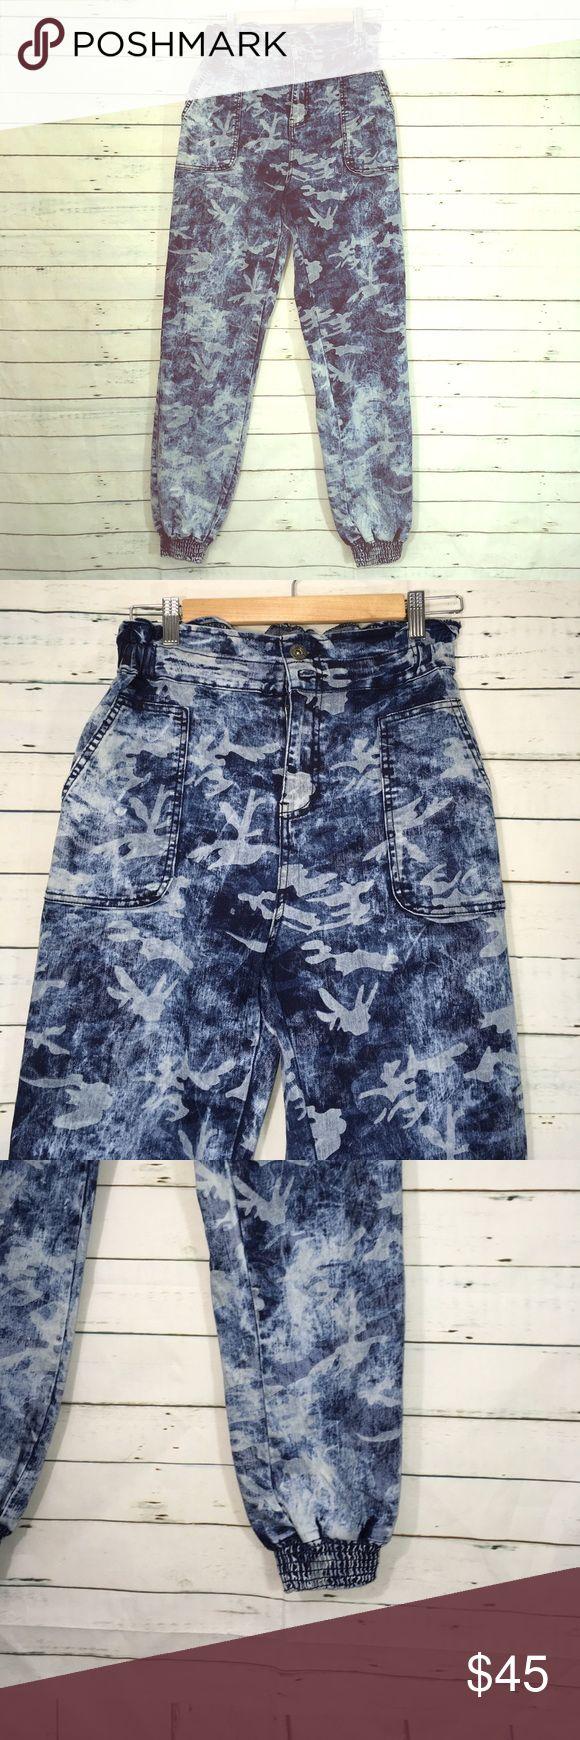 "Denim Camo High Waist Jean Joggers-NWOT Denim Camo High Waist Jean Joggers —NWOT  Waist size XL (12) Inseam 30"" Bukoo Denim Jeans"